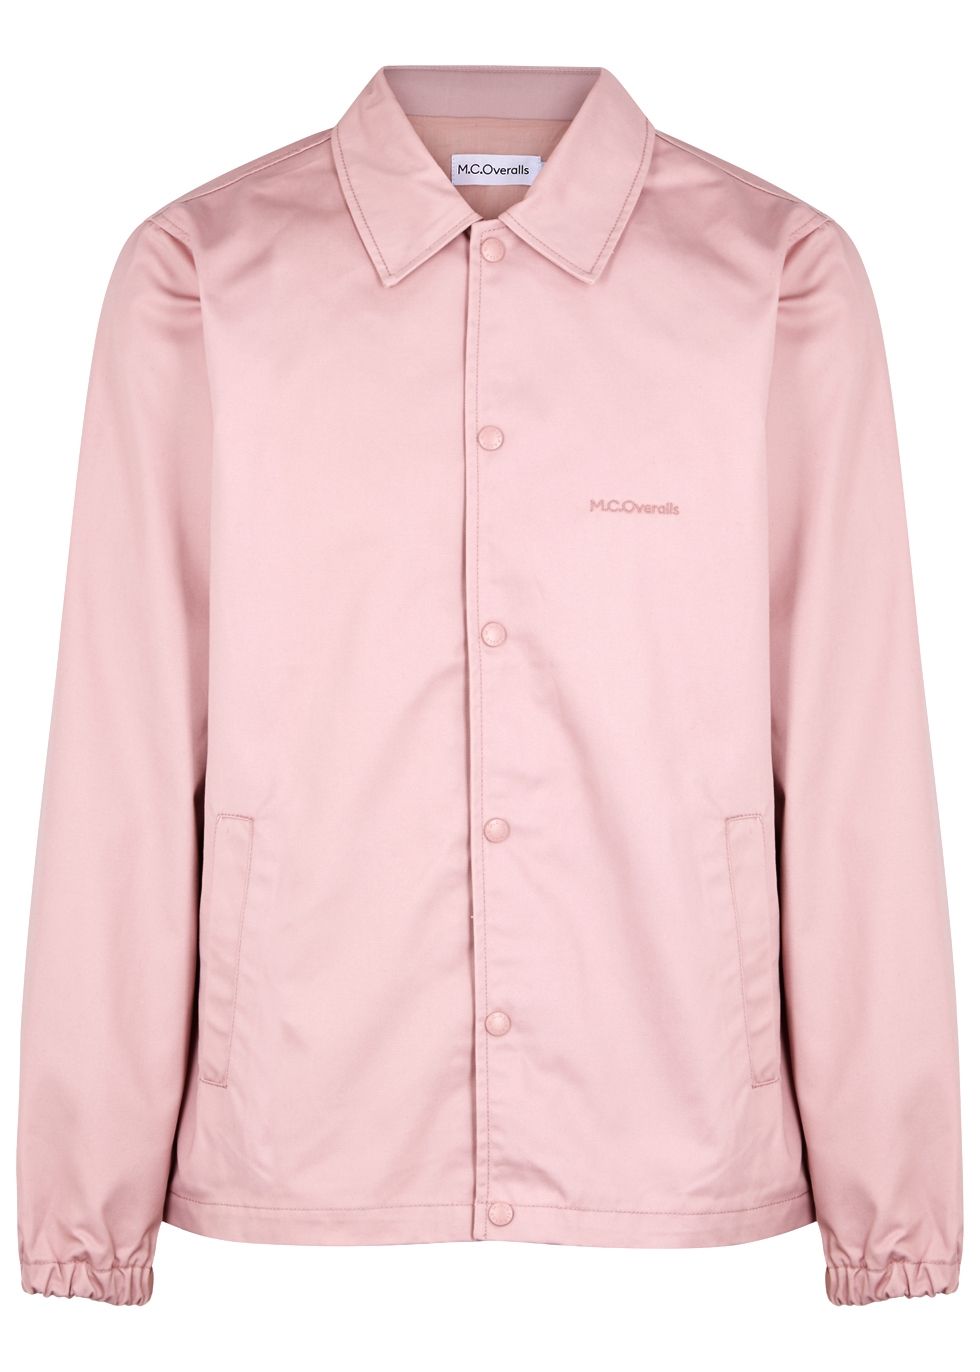 M.C. OVERALLS Dusky Pink Twill Jacket